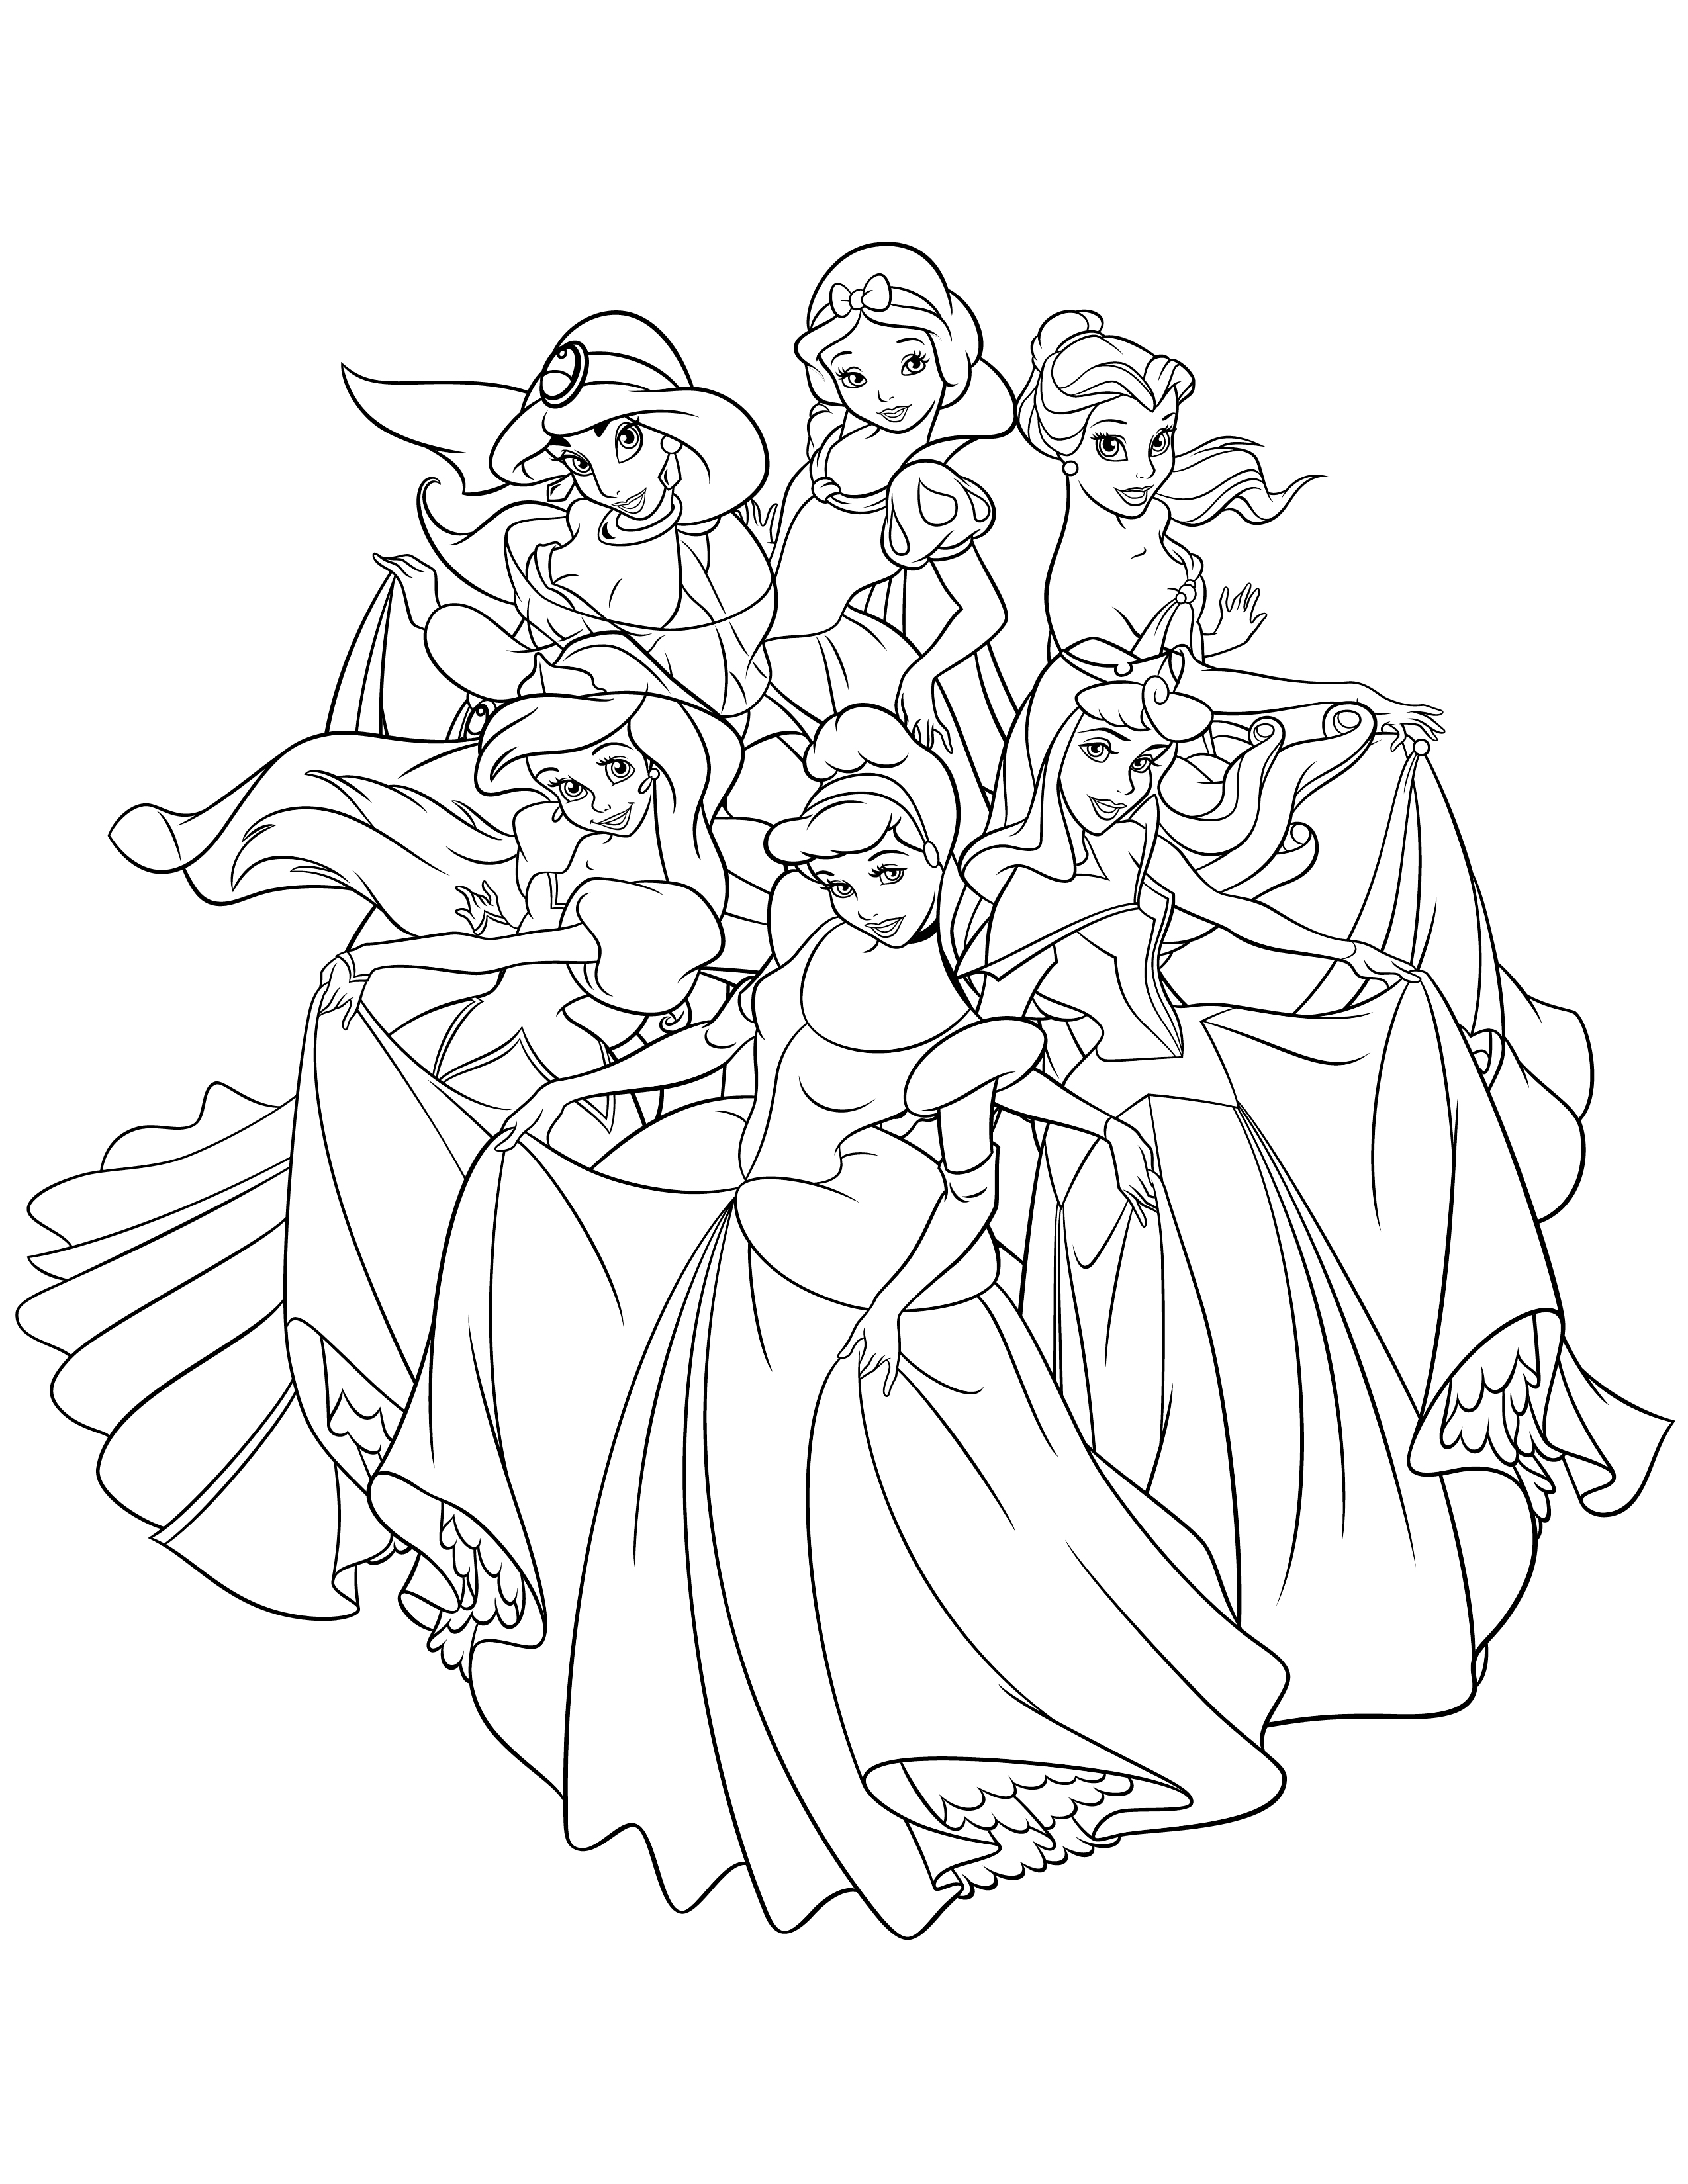 Coloriage de disney princesse imprimer - Prince et princesse dessin ...